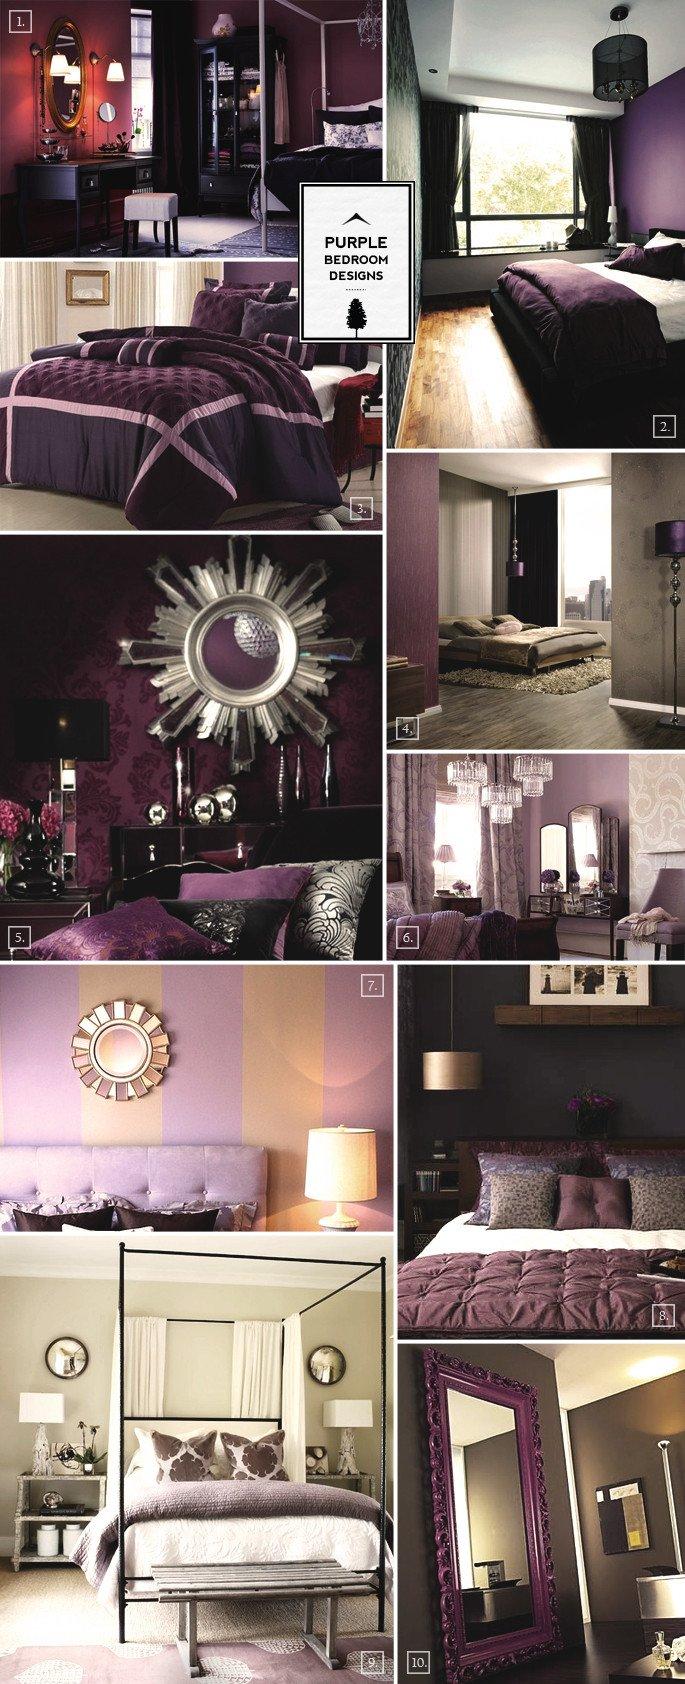 Purple and Grey Bedroom Decor Lovely Purple Bedroom Designs Inspiration Mood Board